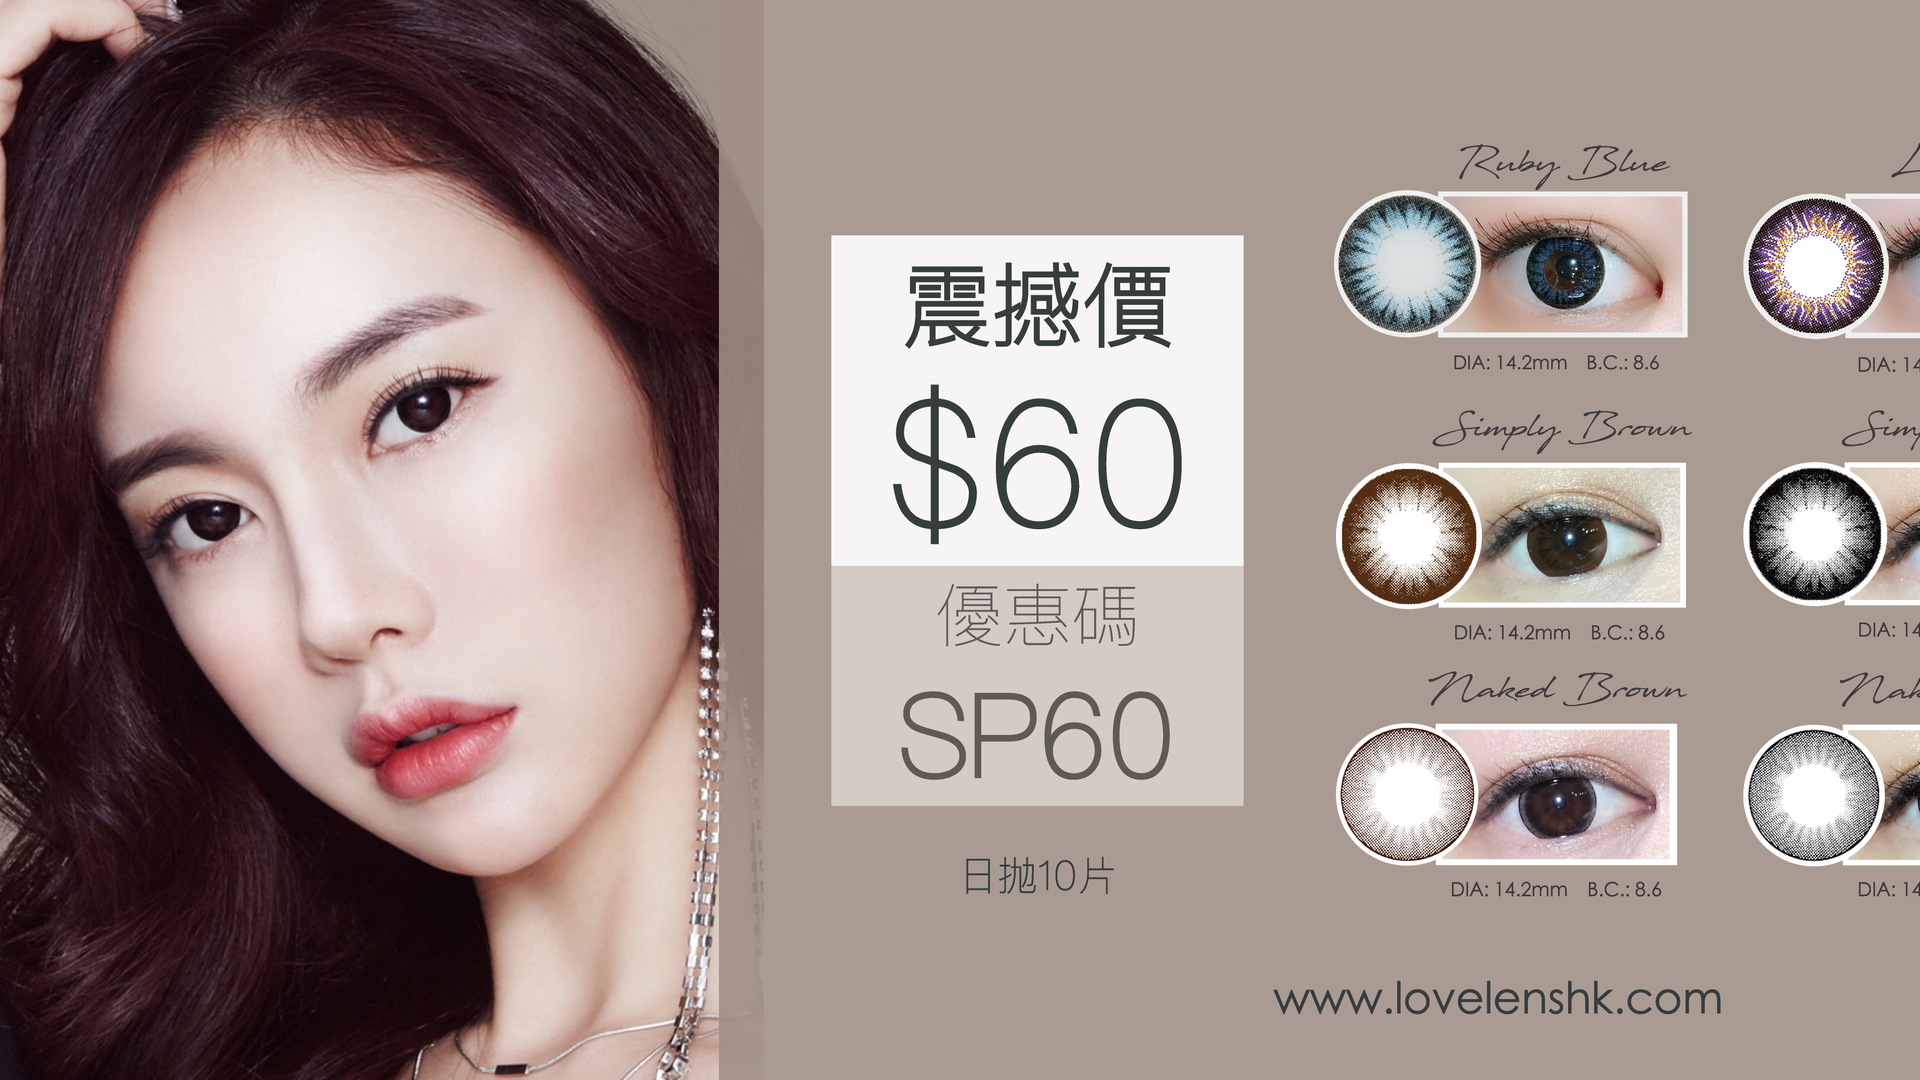 Love Lens Girly 20, 1004 1 Day $60/Box